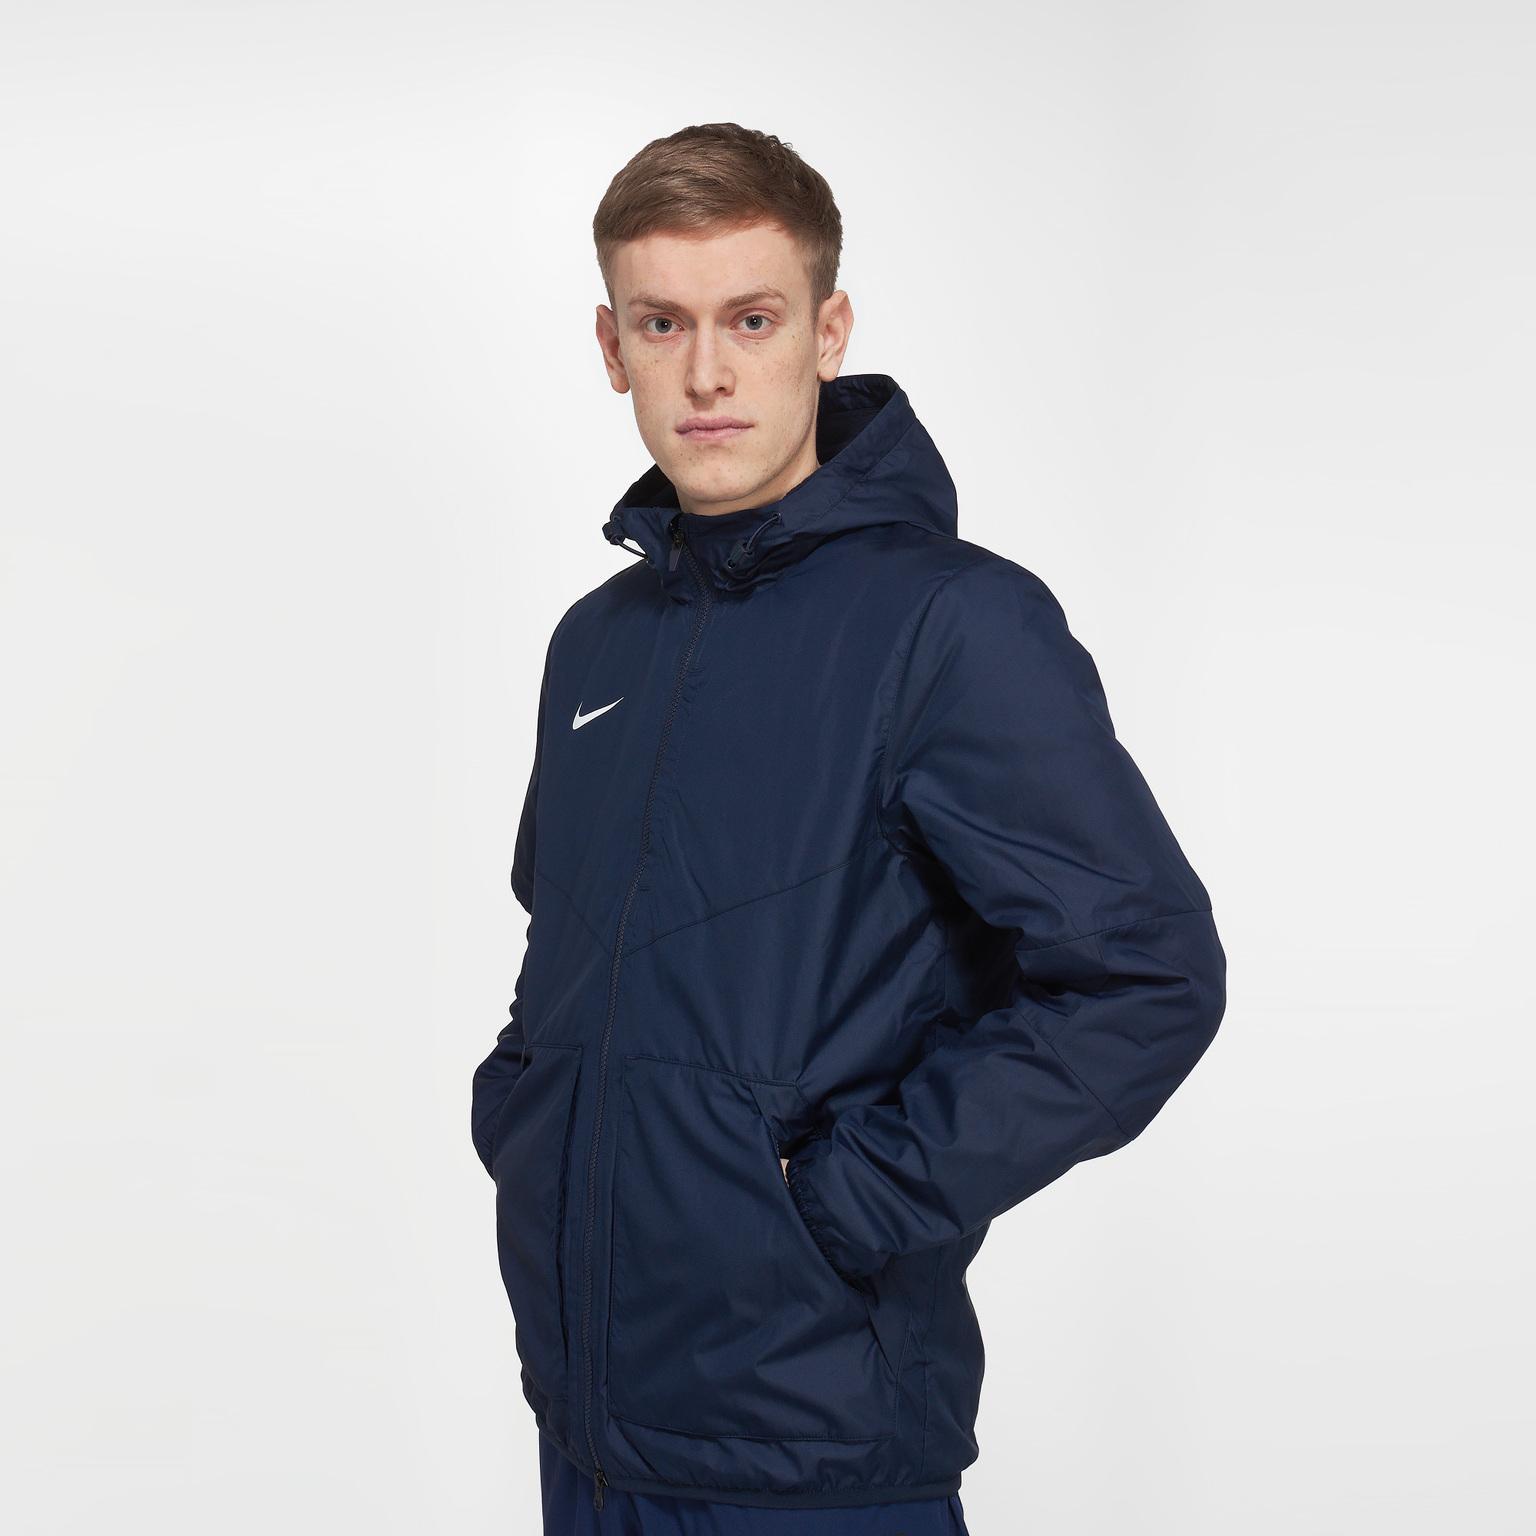 a4521643 Куртка Nike Team Fall Jacket 645550-451 – купить в интернет магазине  footballstore, цена, фото